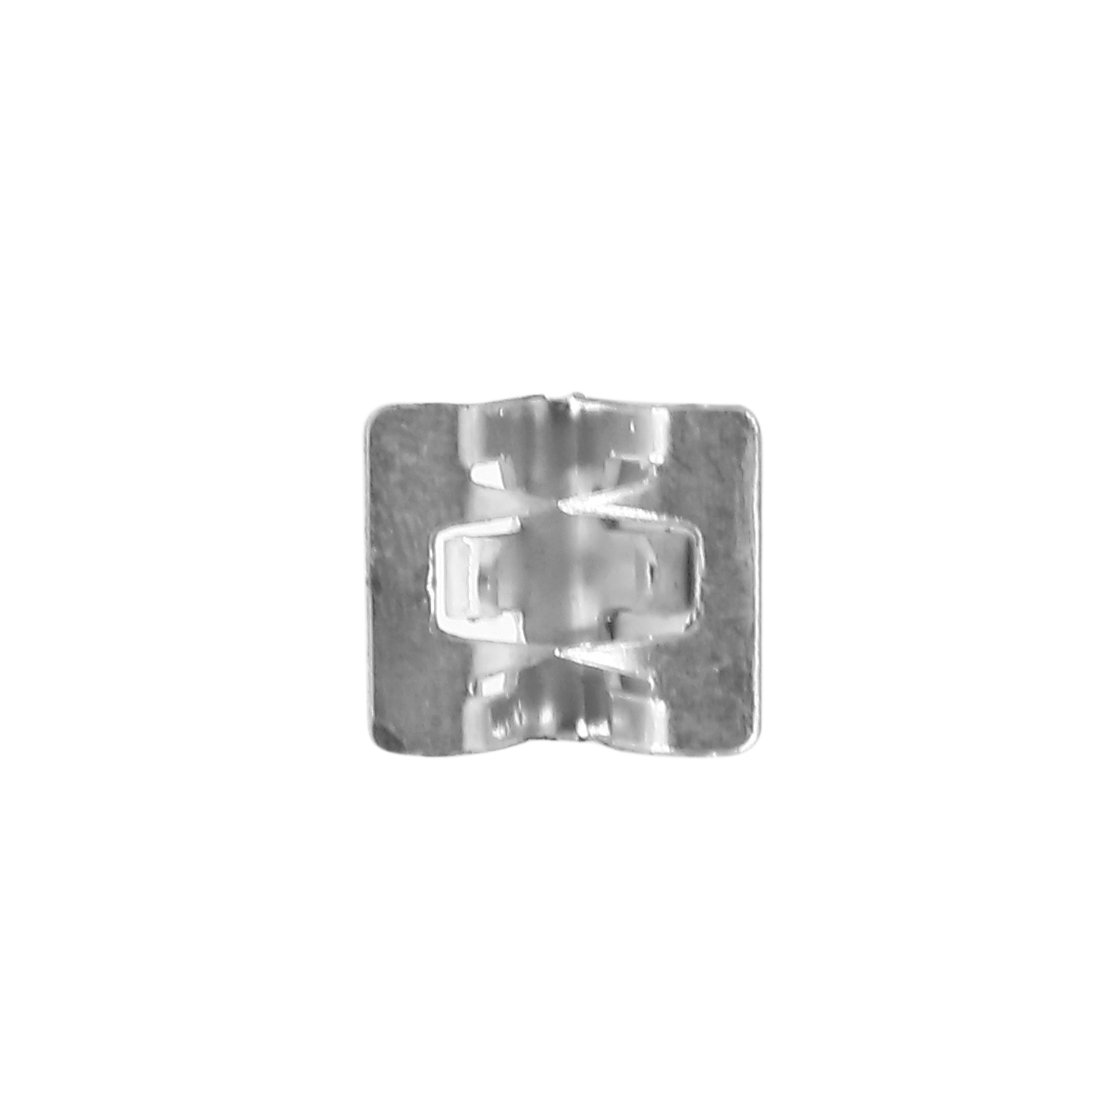 Sourcingmap 10Pcs Metal Rivets Car Interior Dashboard Panel Trim Clips Silver Tone